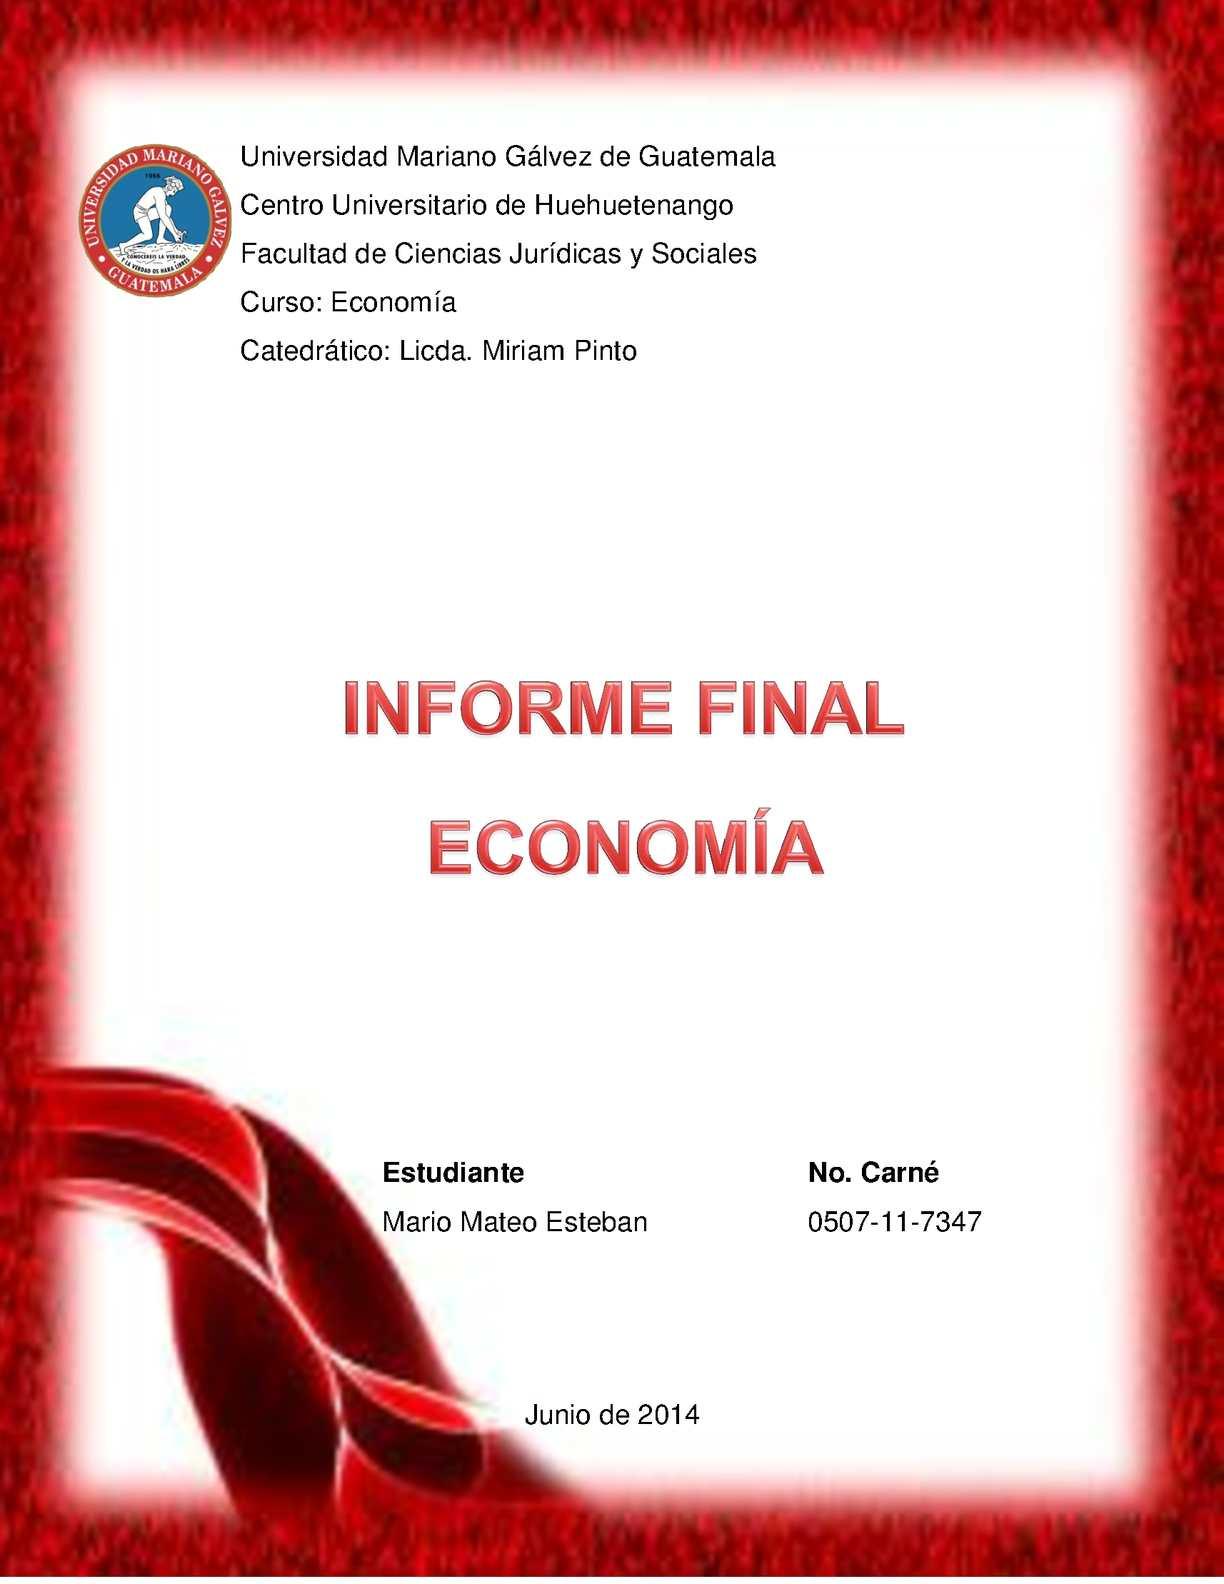 INFORME FINAL ECONOMÍA